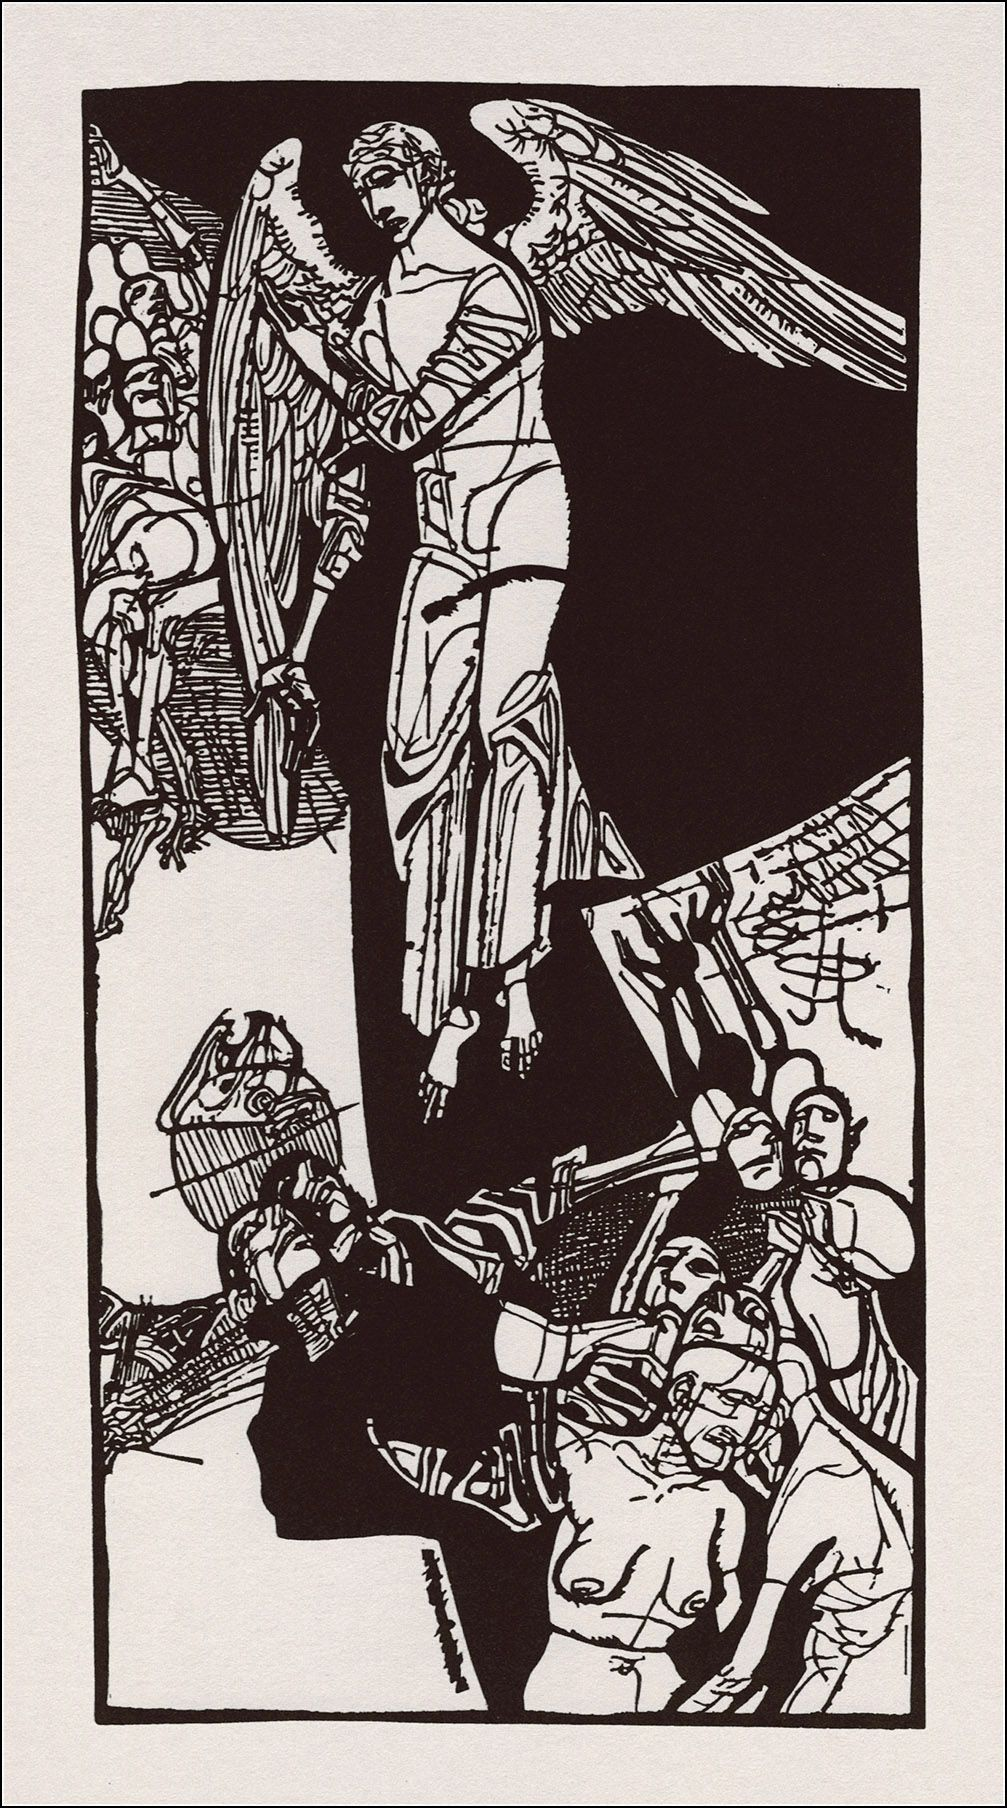 Dante Alighieri. Božská komédia: Očistec / Tatran, Bratislava, 1982 / Illustrator Vincent Hložník